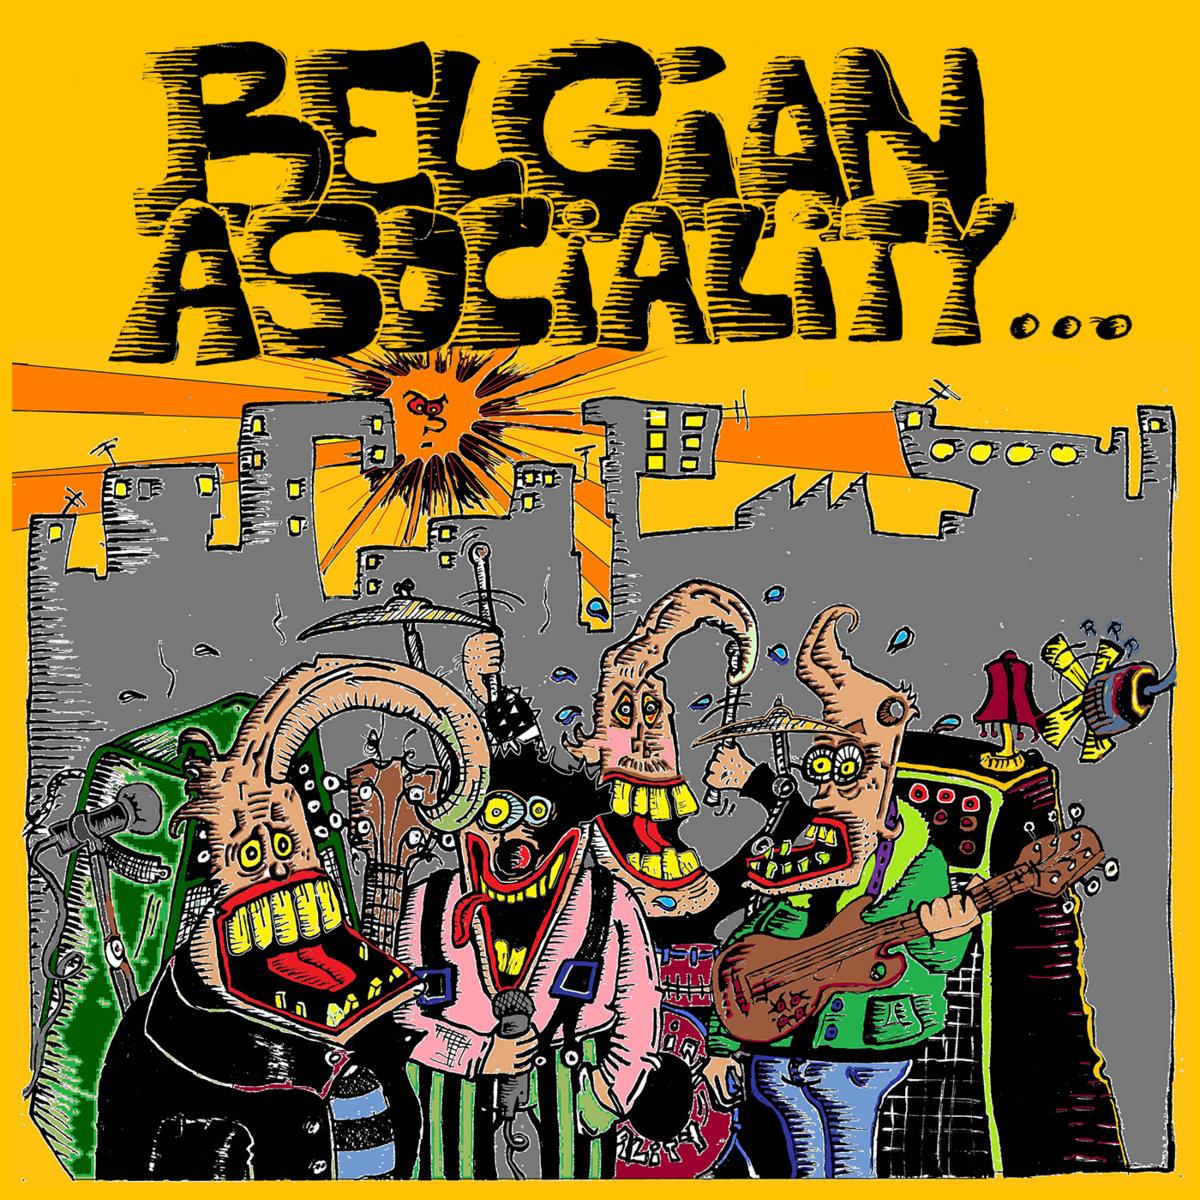 Belgian Asociality Десоциализация